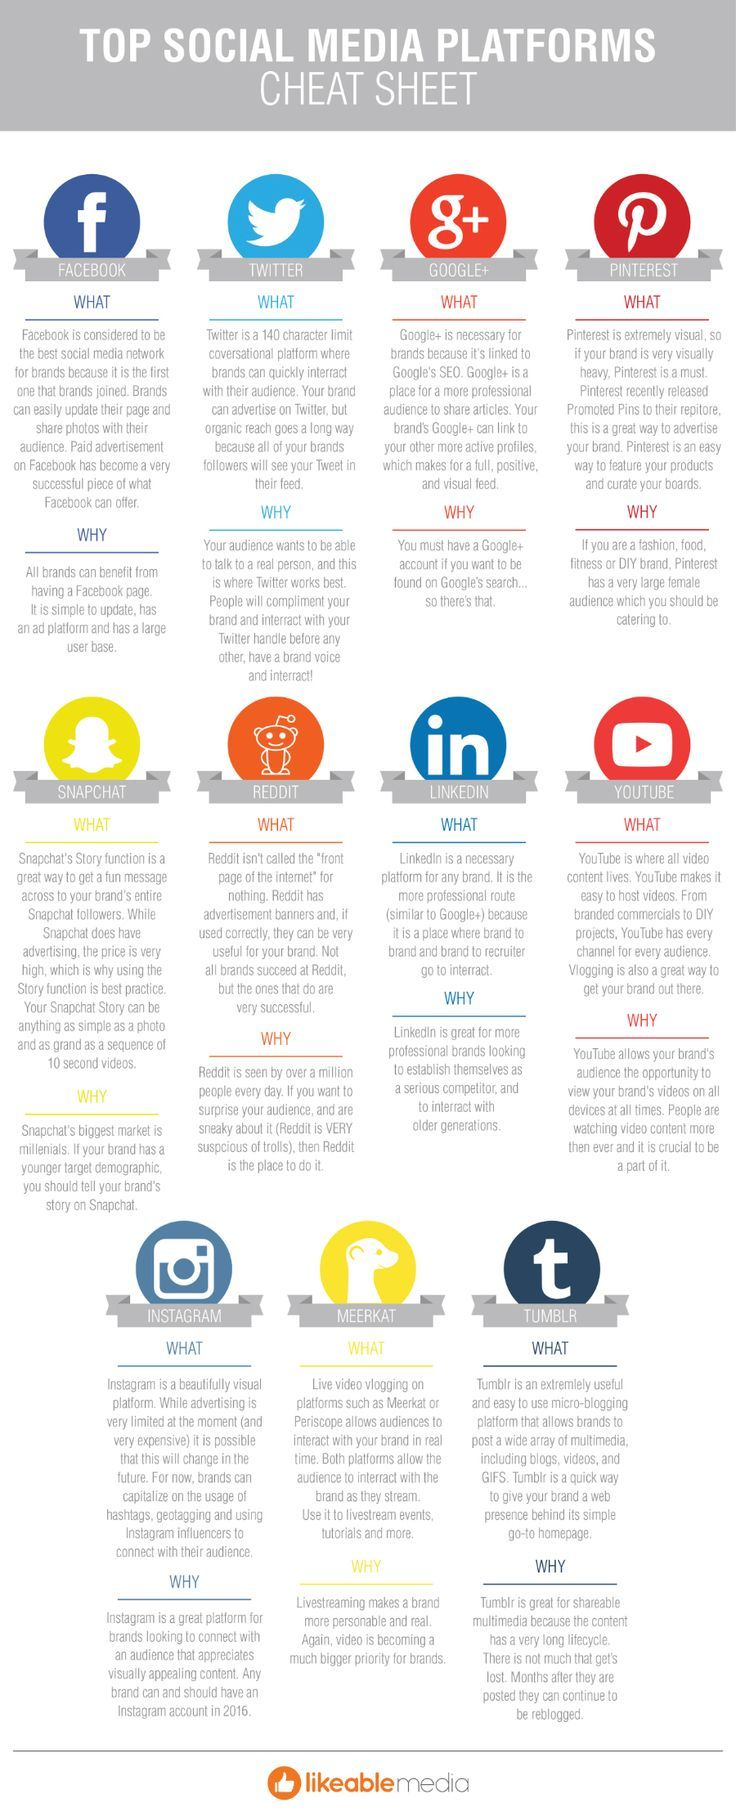 Top Social Media Platforms Cheat Sheet [Infographic]